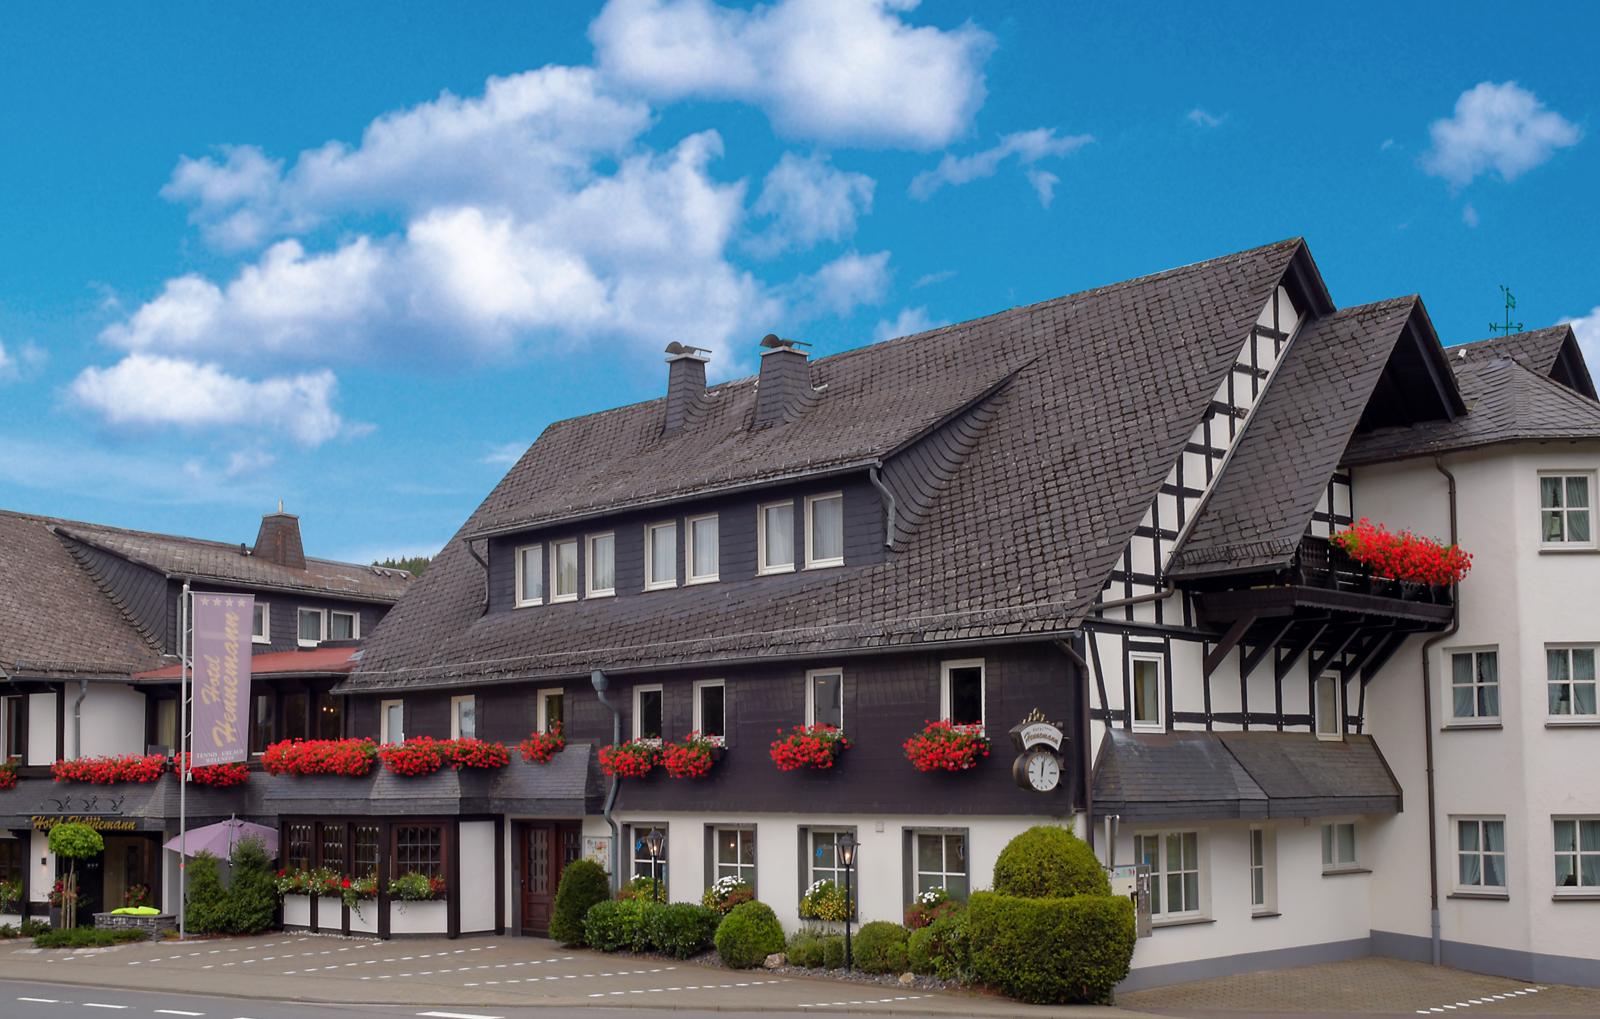 aktivurlaub-an-land-eslohe-cobbenrode-bg9